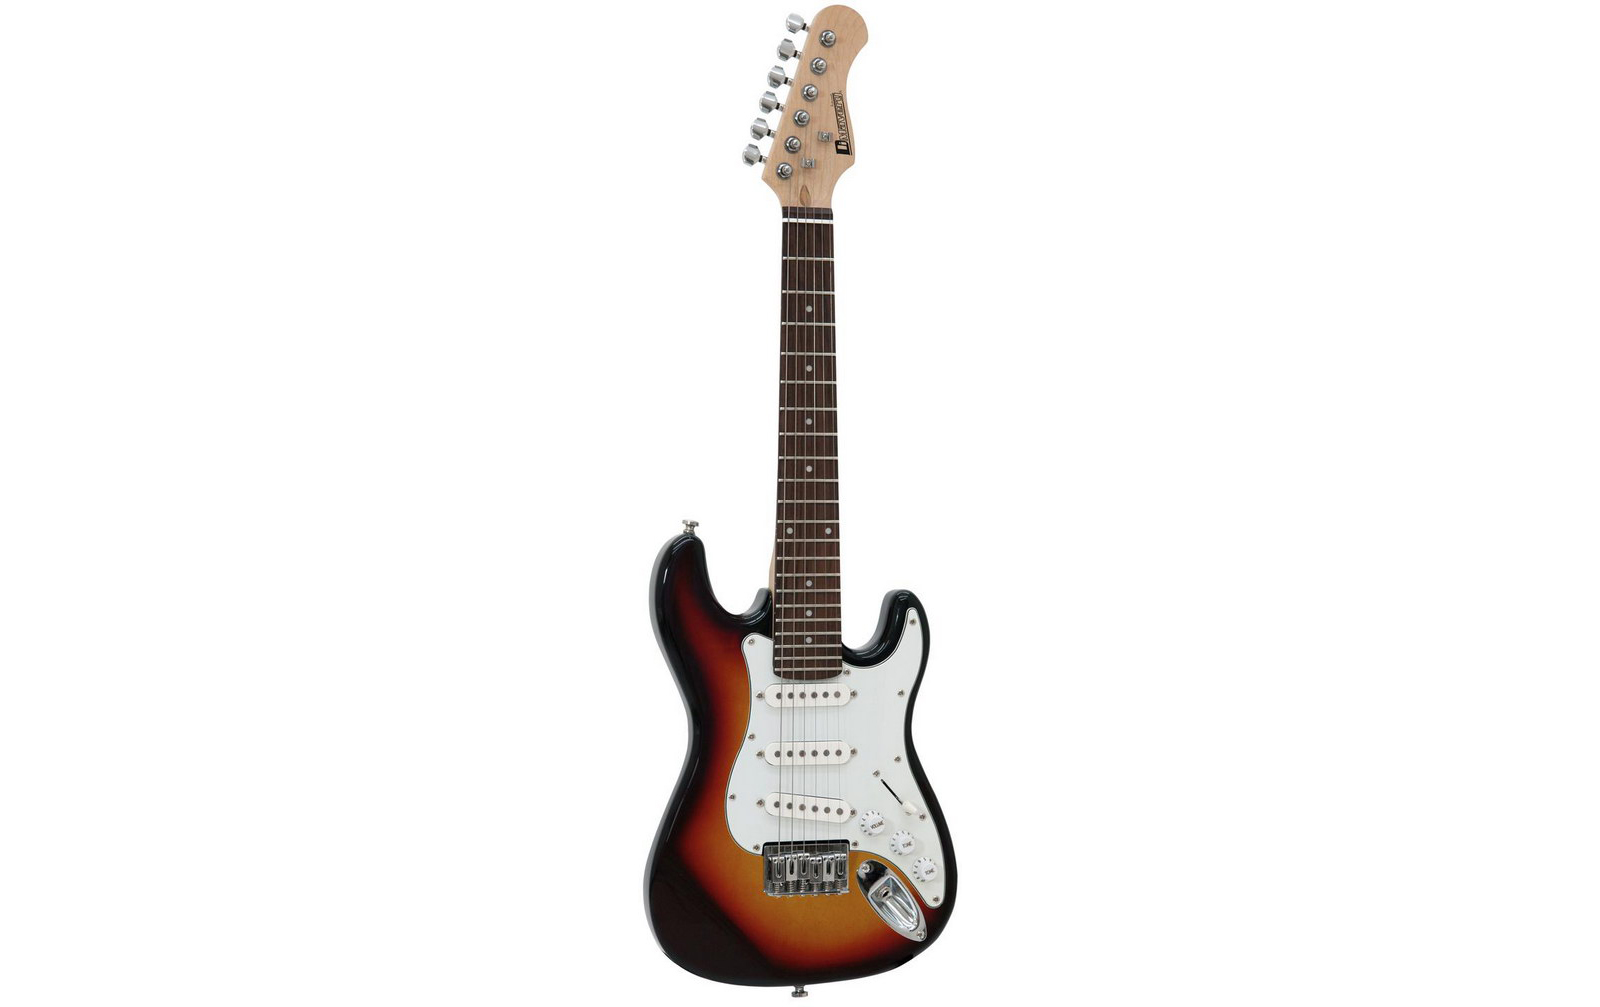 dimavery-j-350-e-gitarre-st-sunburst